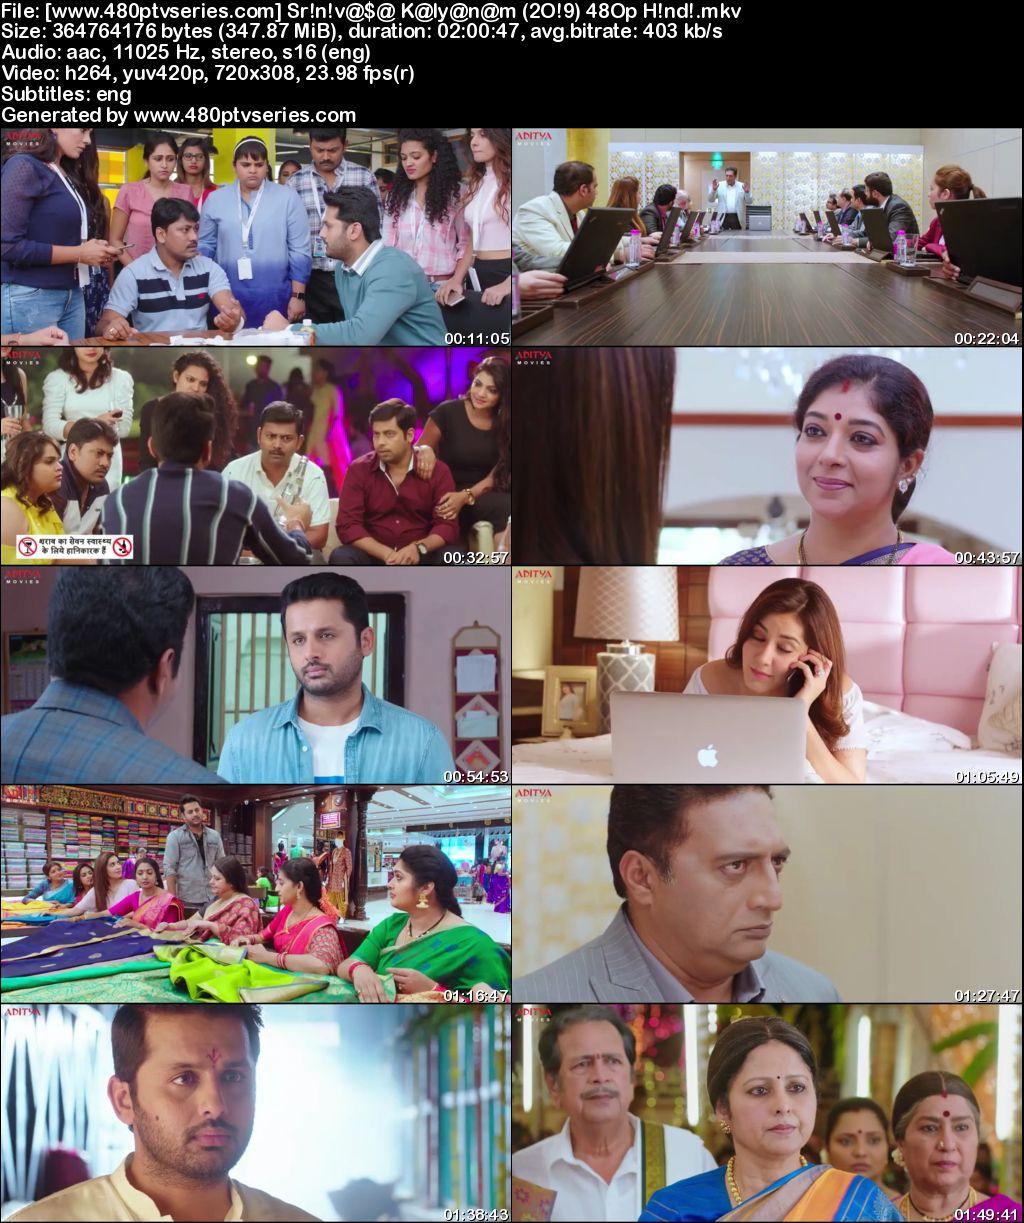 Srinivasa Kalyanam (2019) 350MB Full Hindi Dubbed Movie Download 480p HDRip Free Watch Online Full Movie Download Worldfree4u 9xmovies